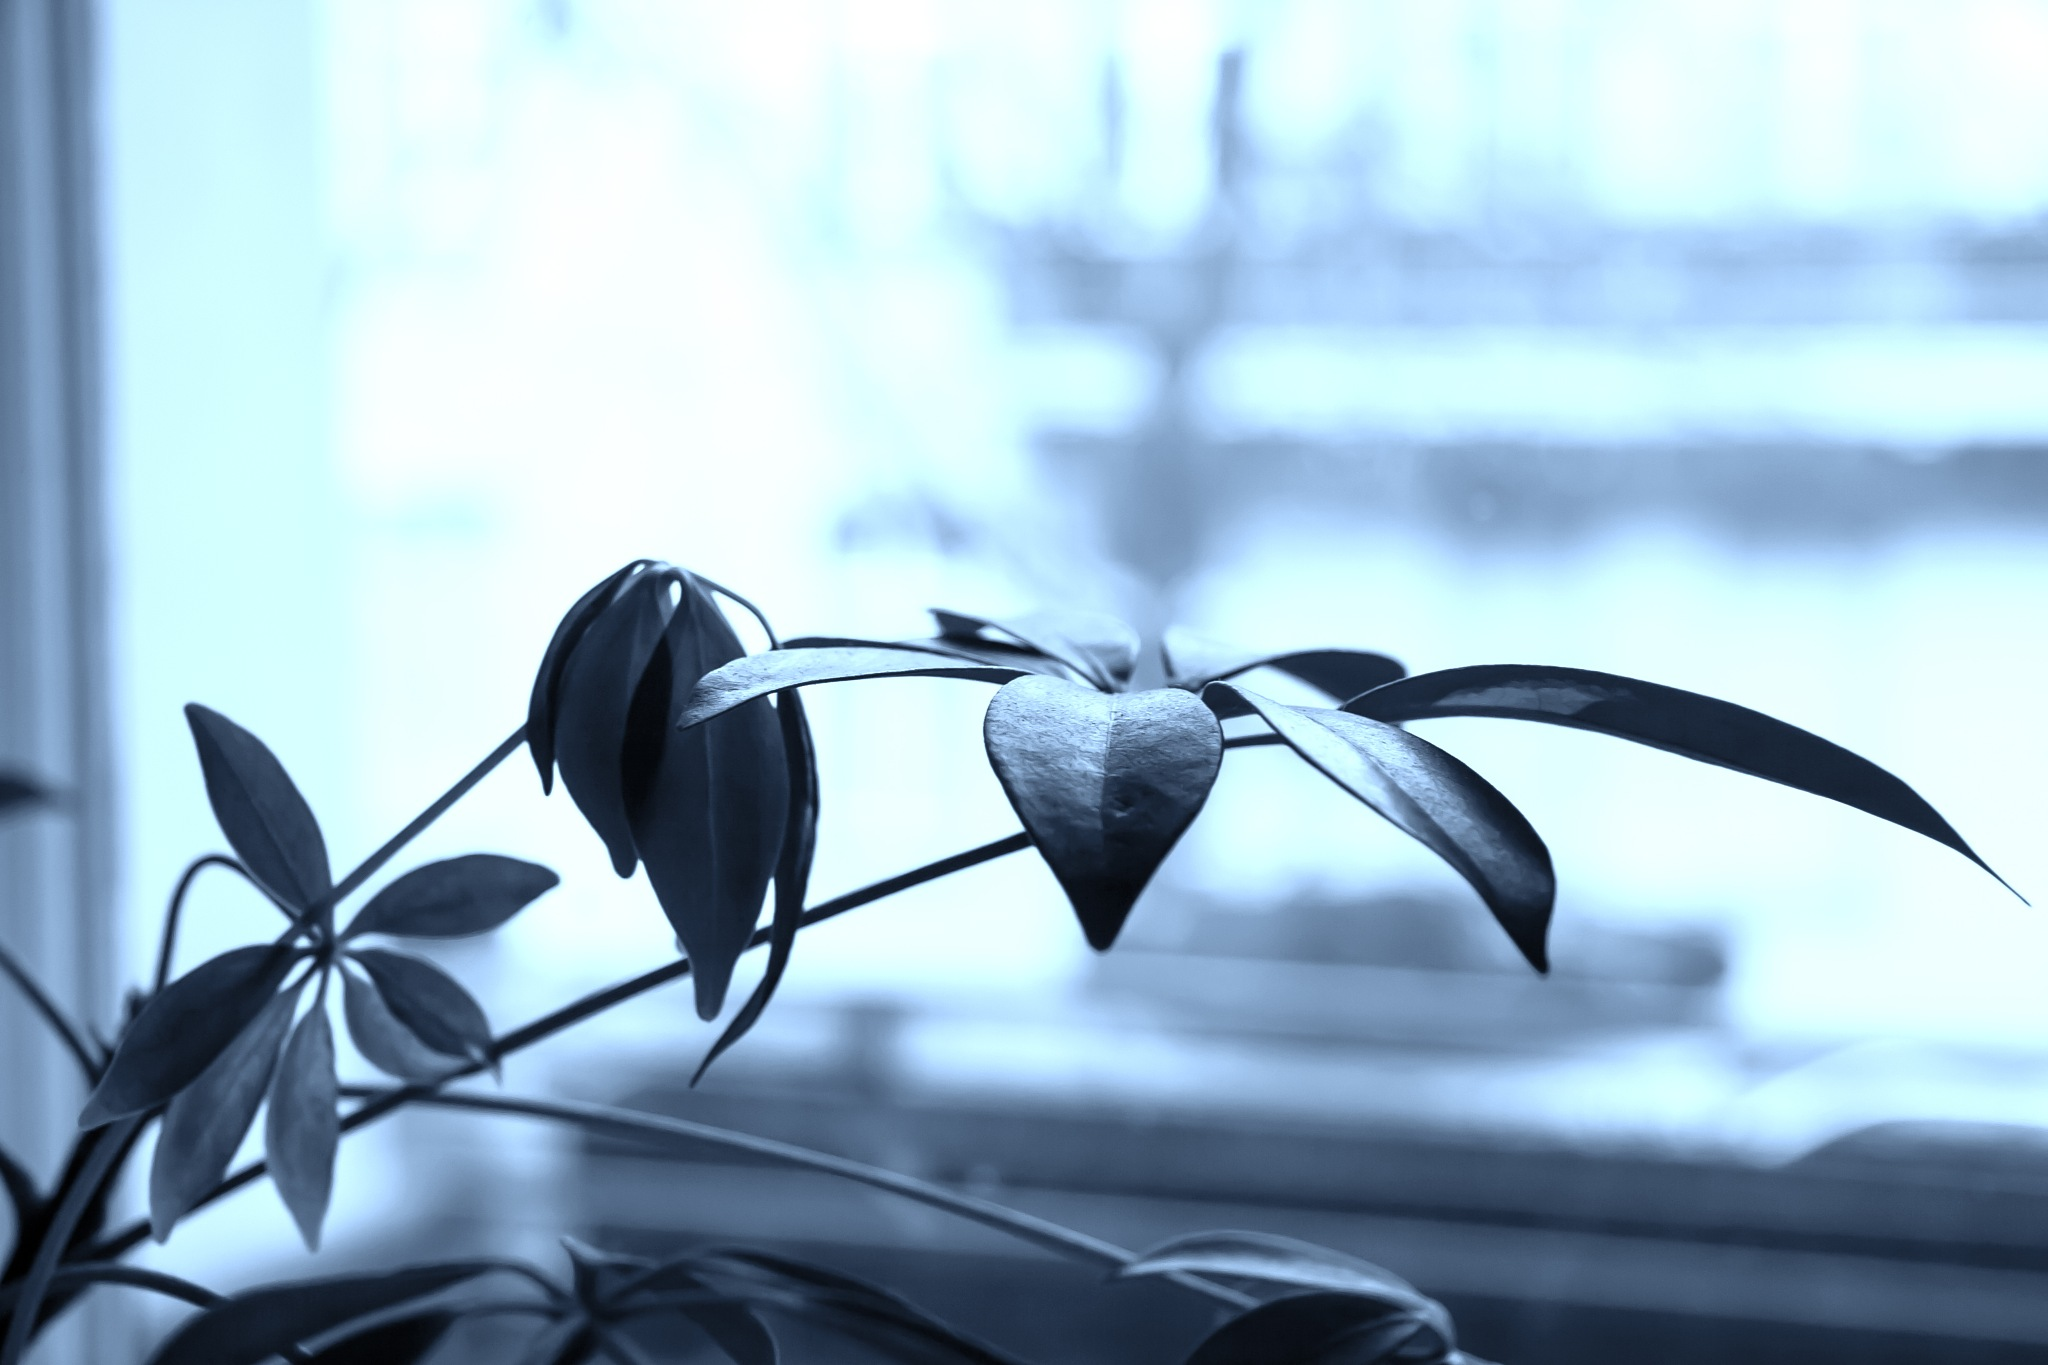 Blue Branch by Iri Kirova